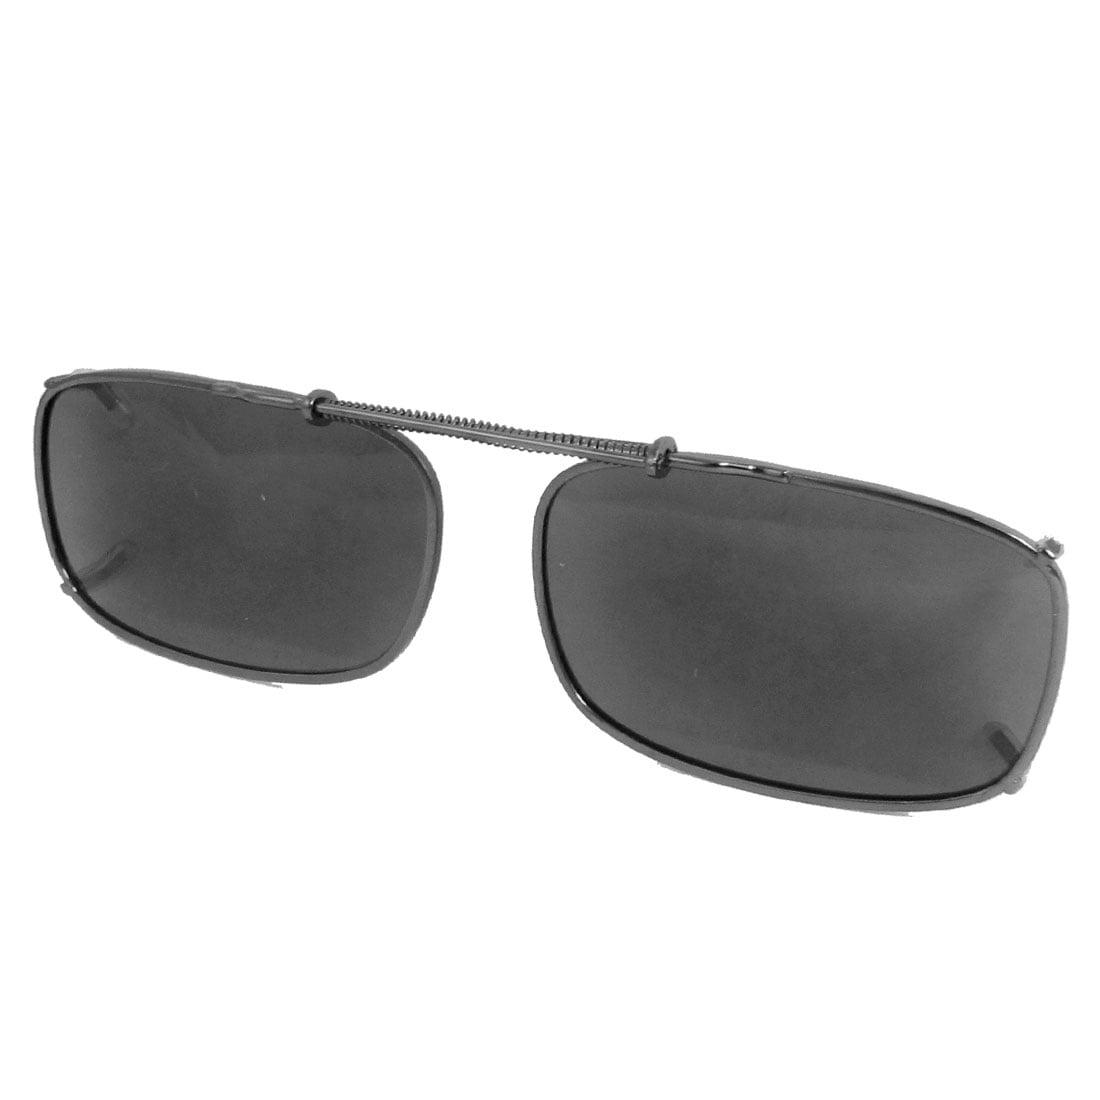 Polarized Sunglasses Driving Glasses Sport Night Vision Goggles ...